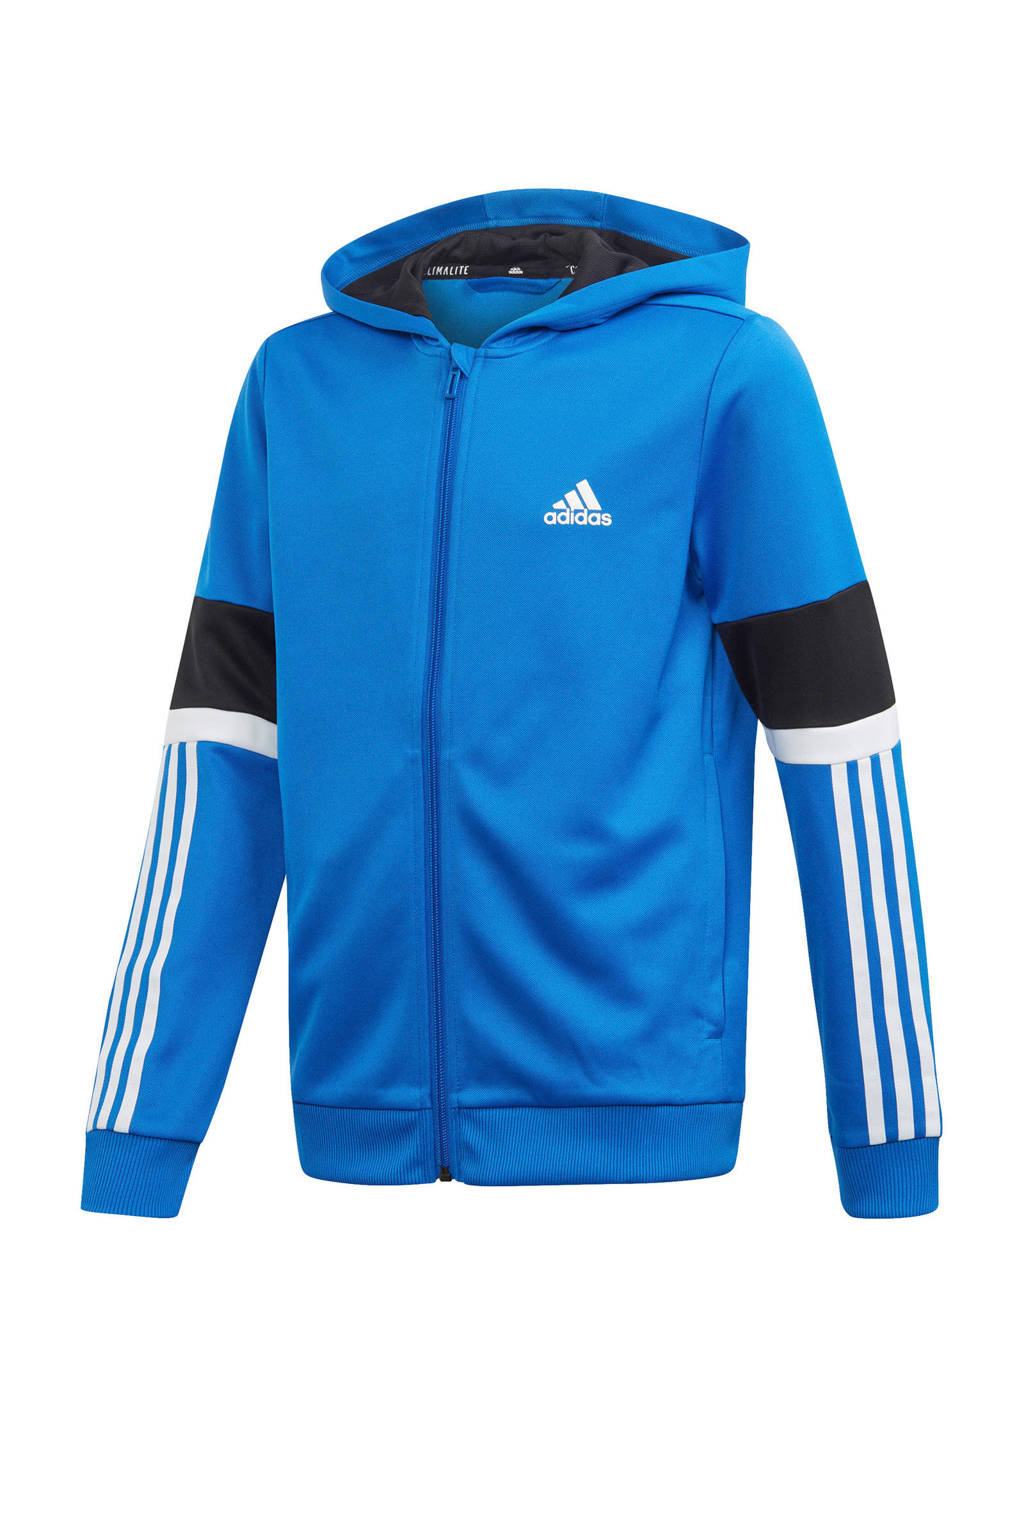 adidas   sportvest blauw, Blauw/zwart/wit